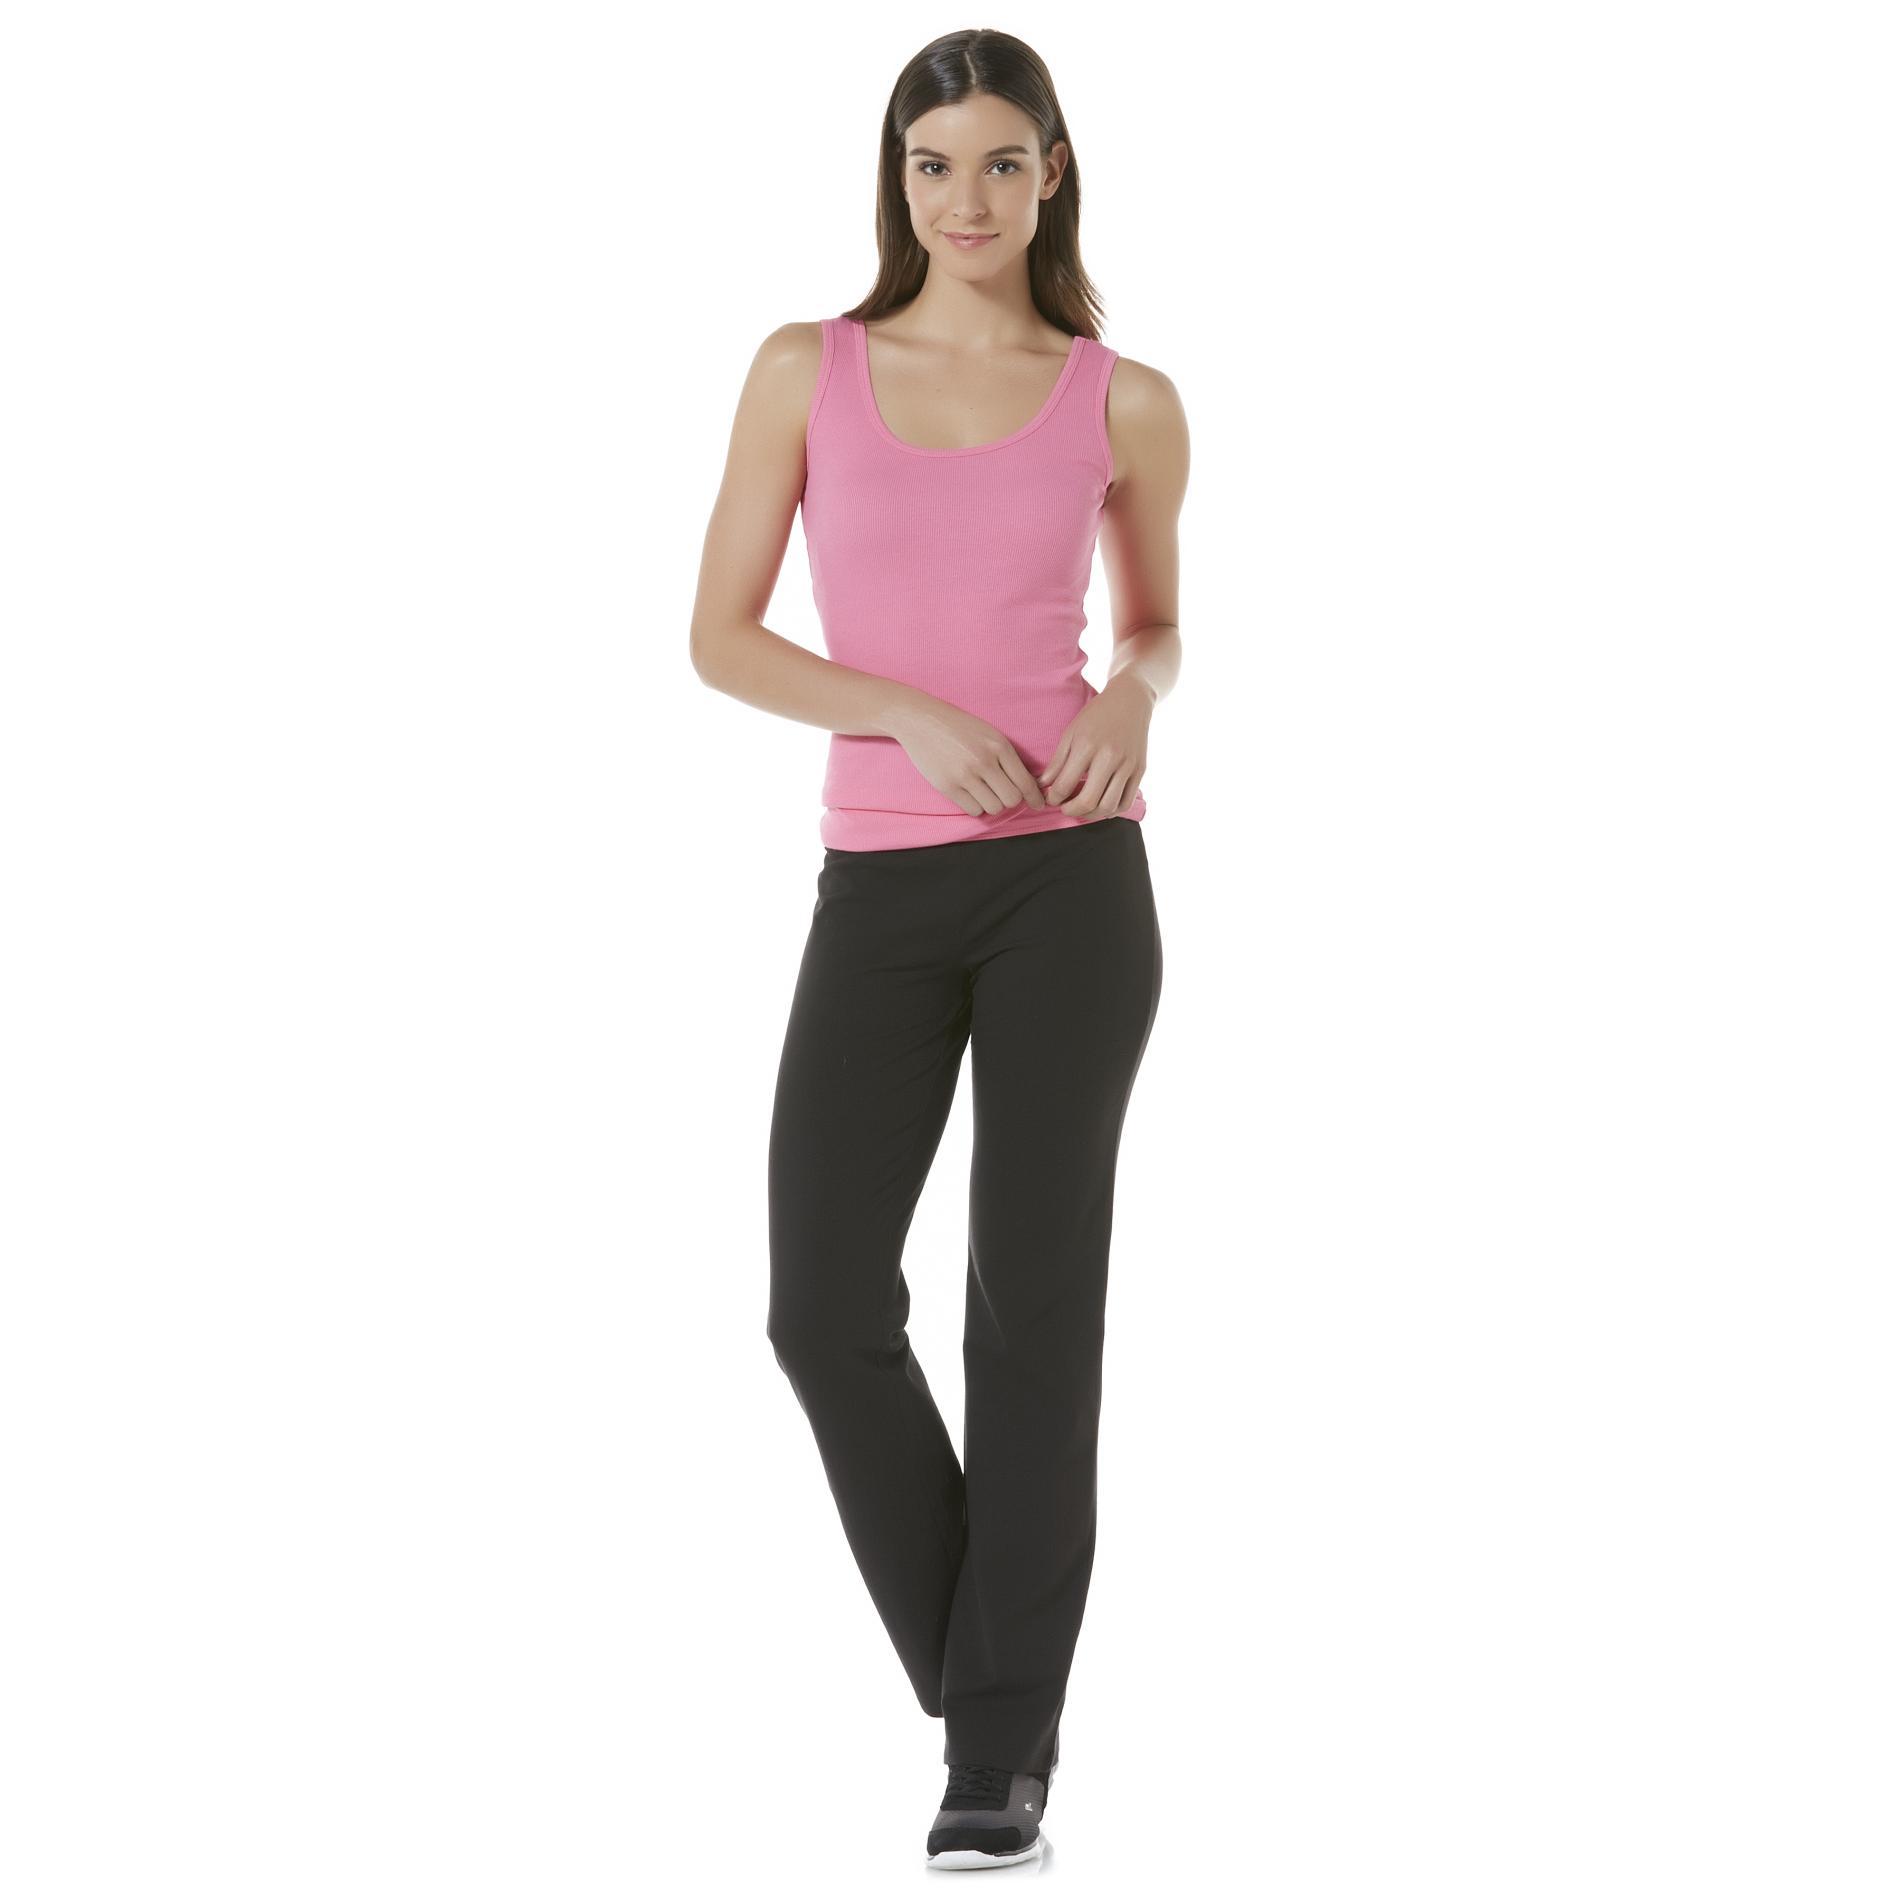 Tank Top And Yoga Pants Hx9XG6pK